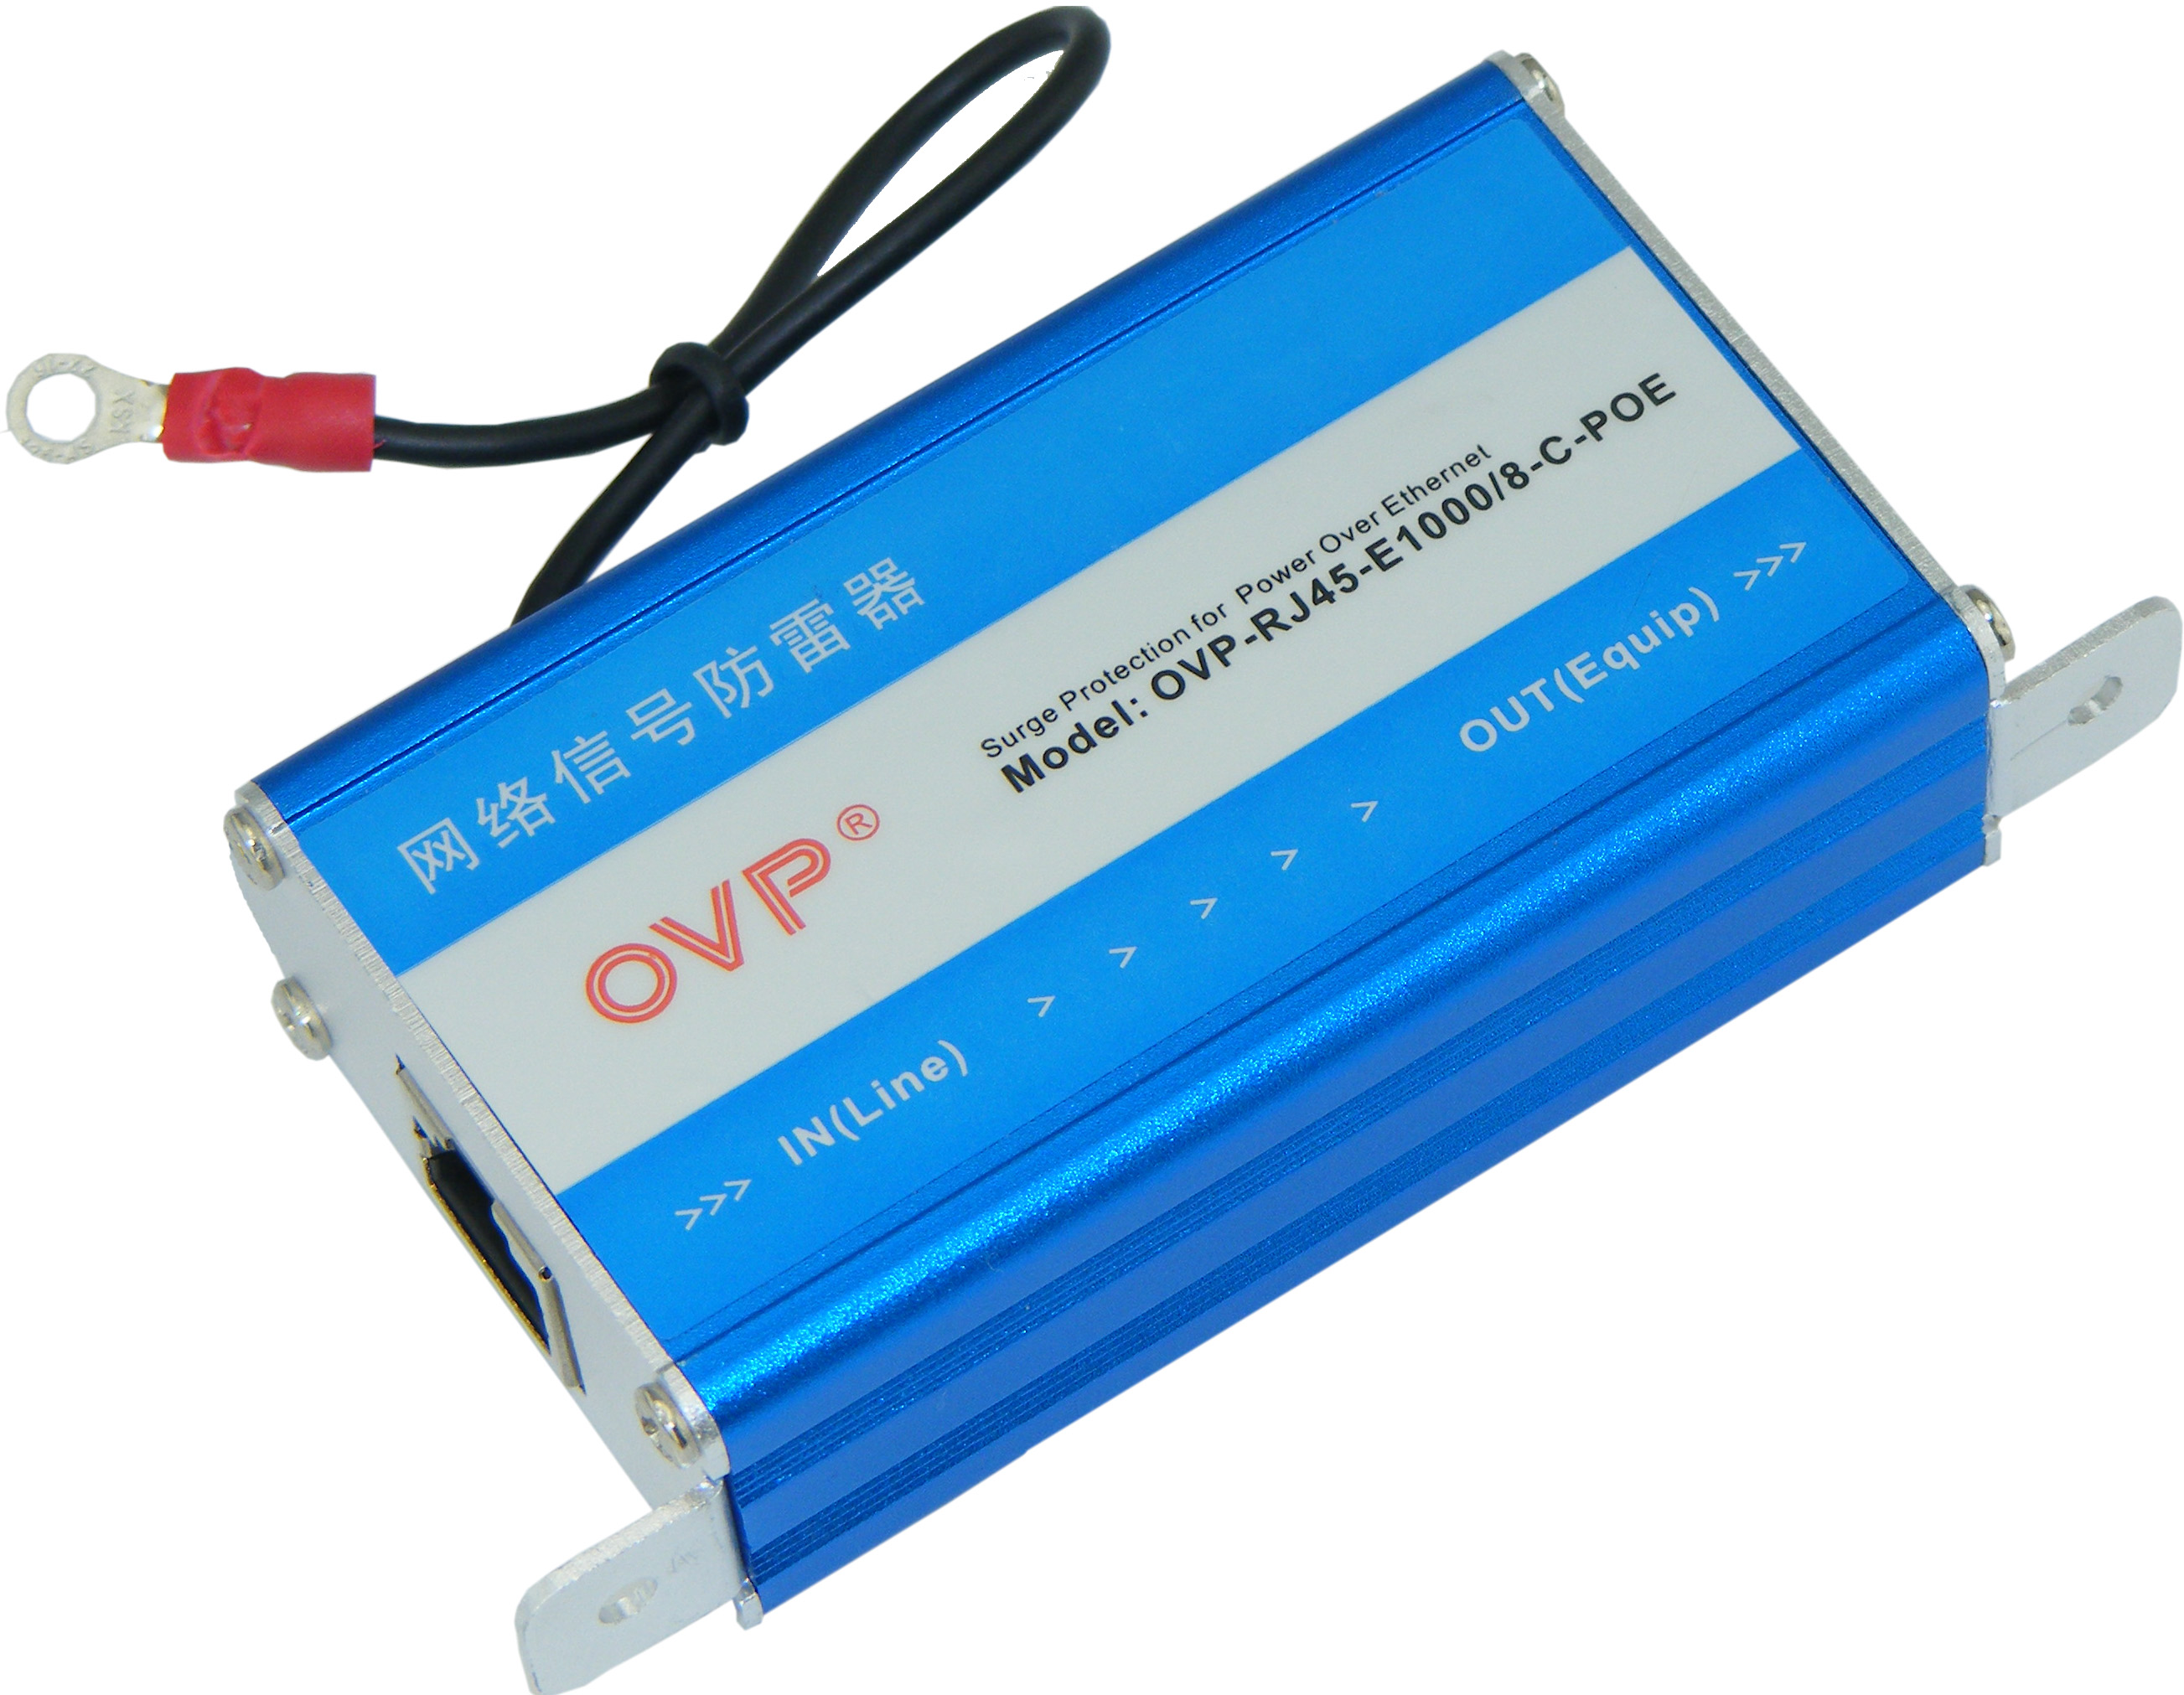 Gigabit POE Lightning Protection Device 1000 Megabit POE Network Signal Arrester Wireless Bridge Arrester in POE Network